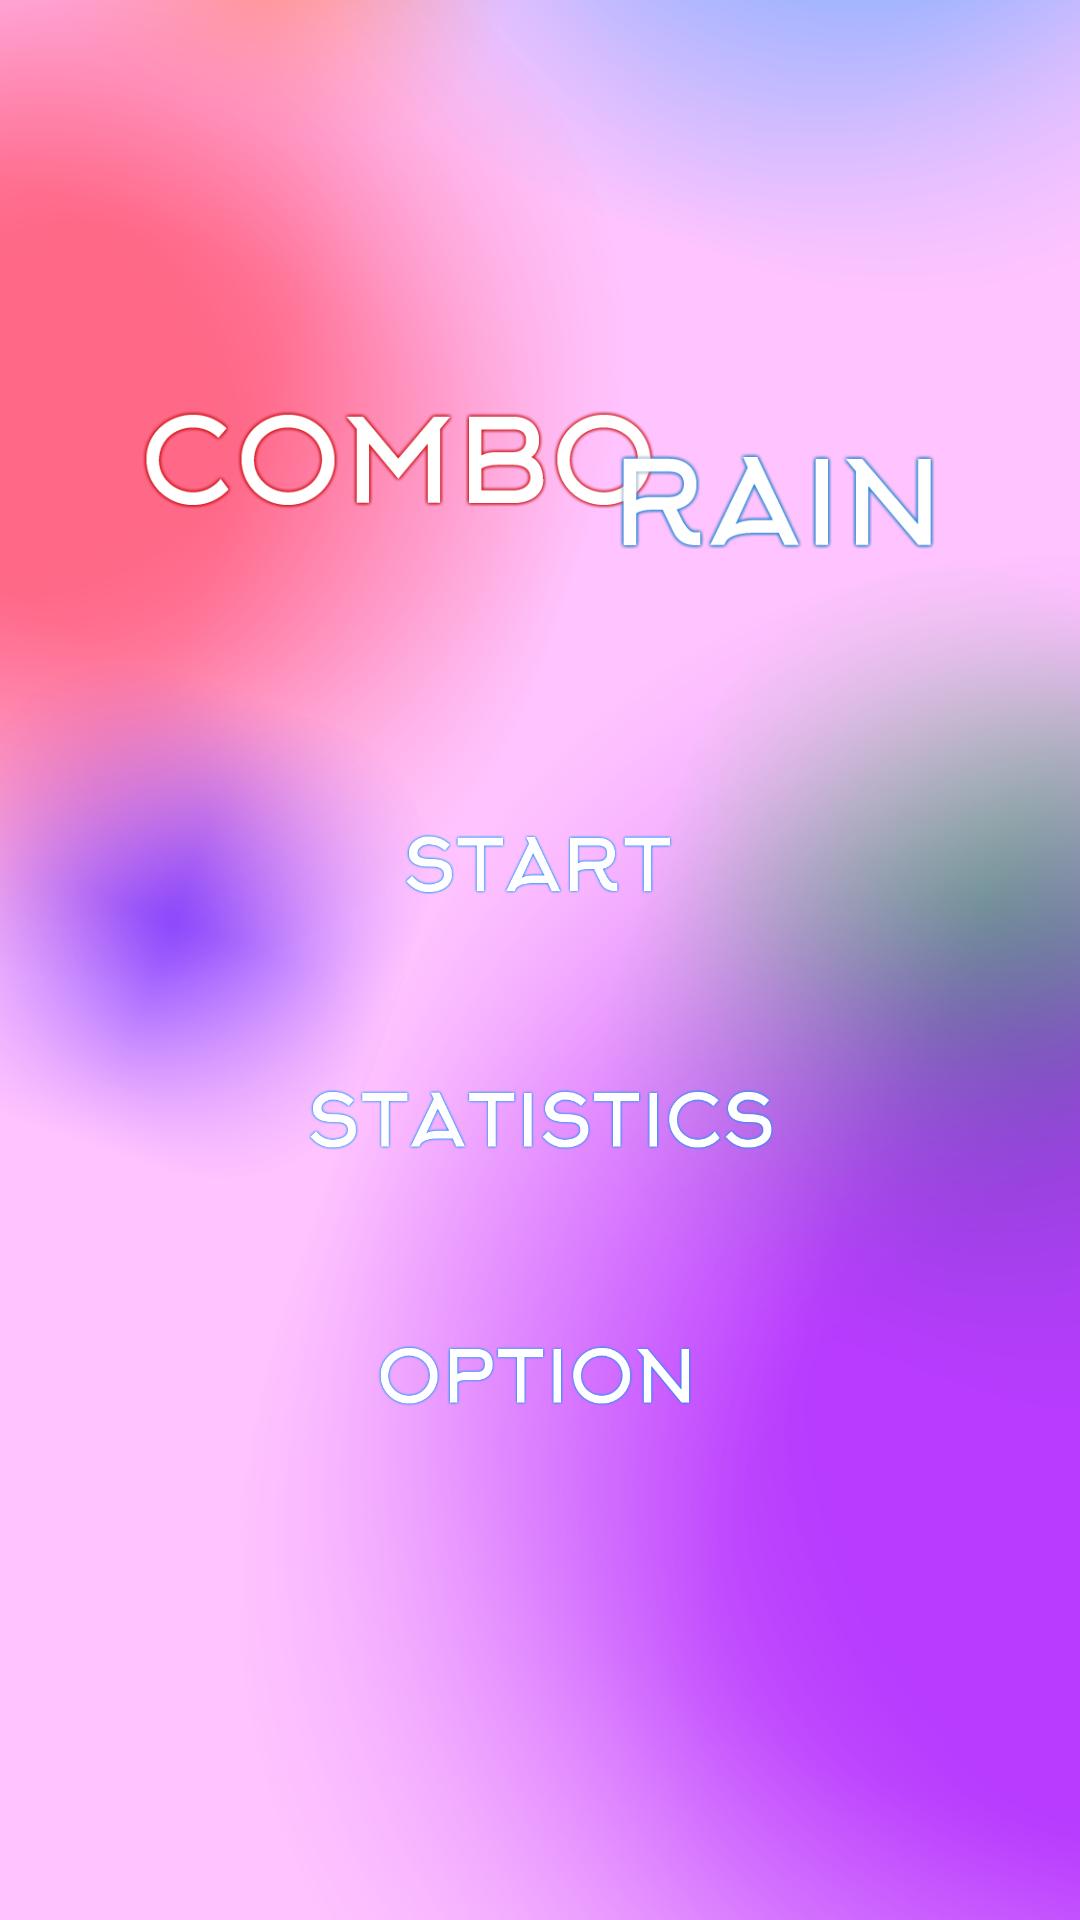 ComboRain